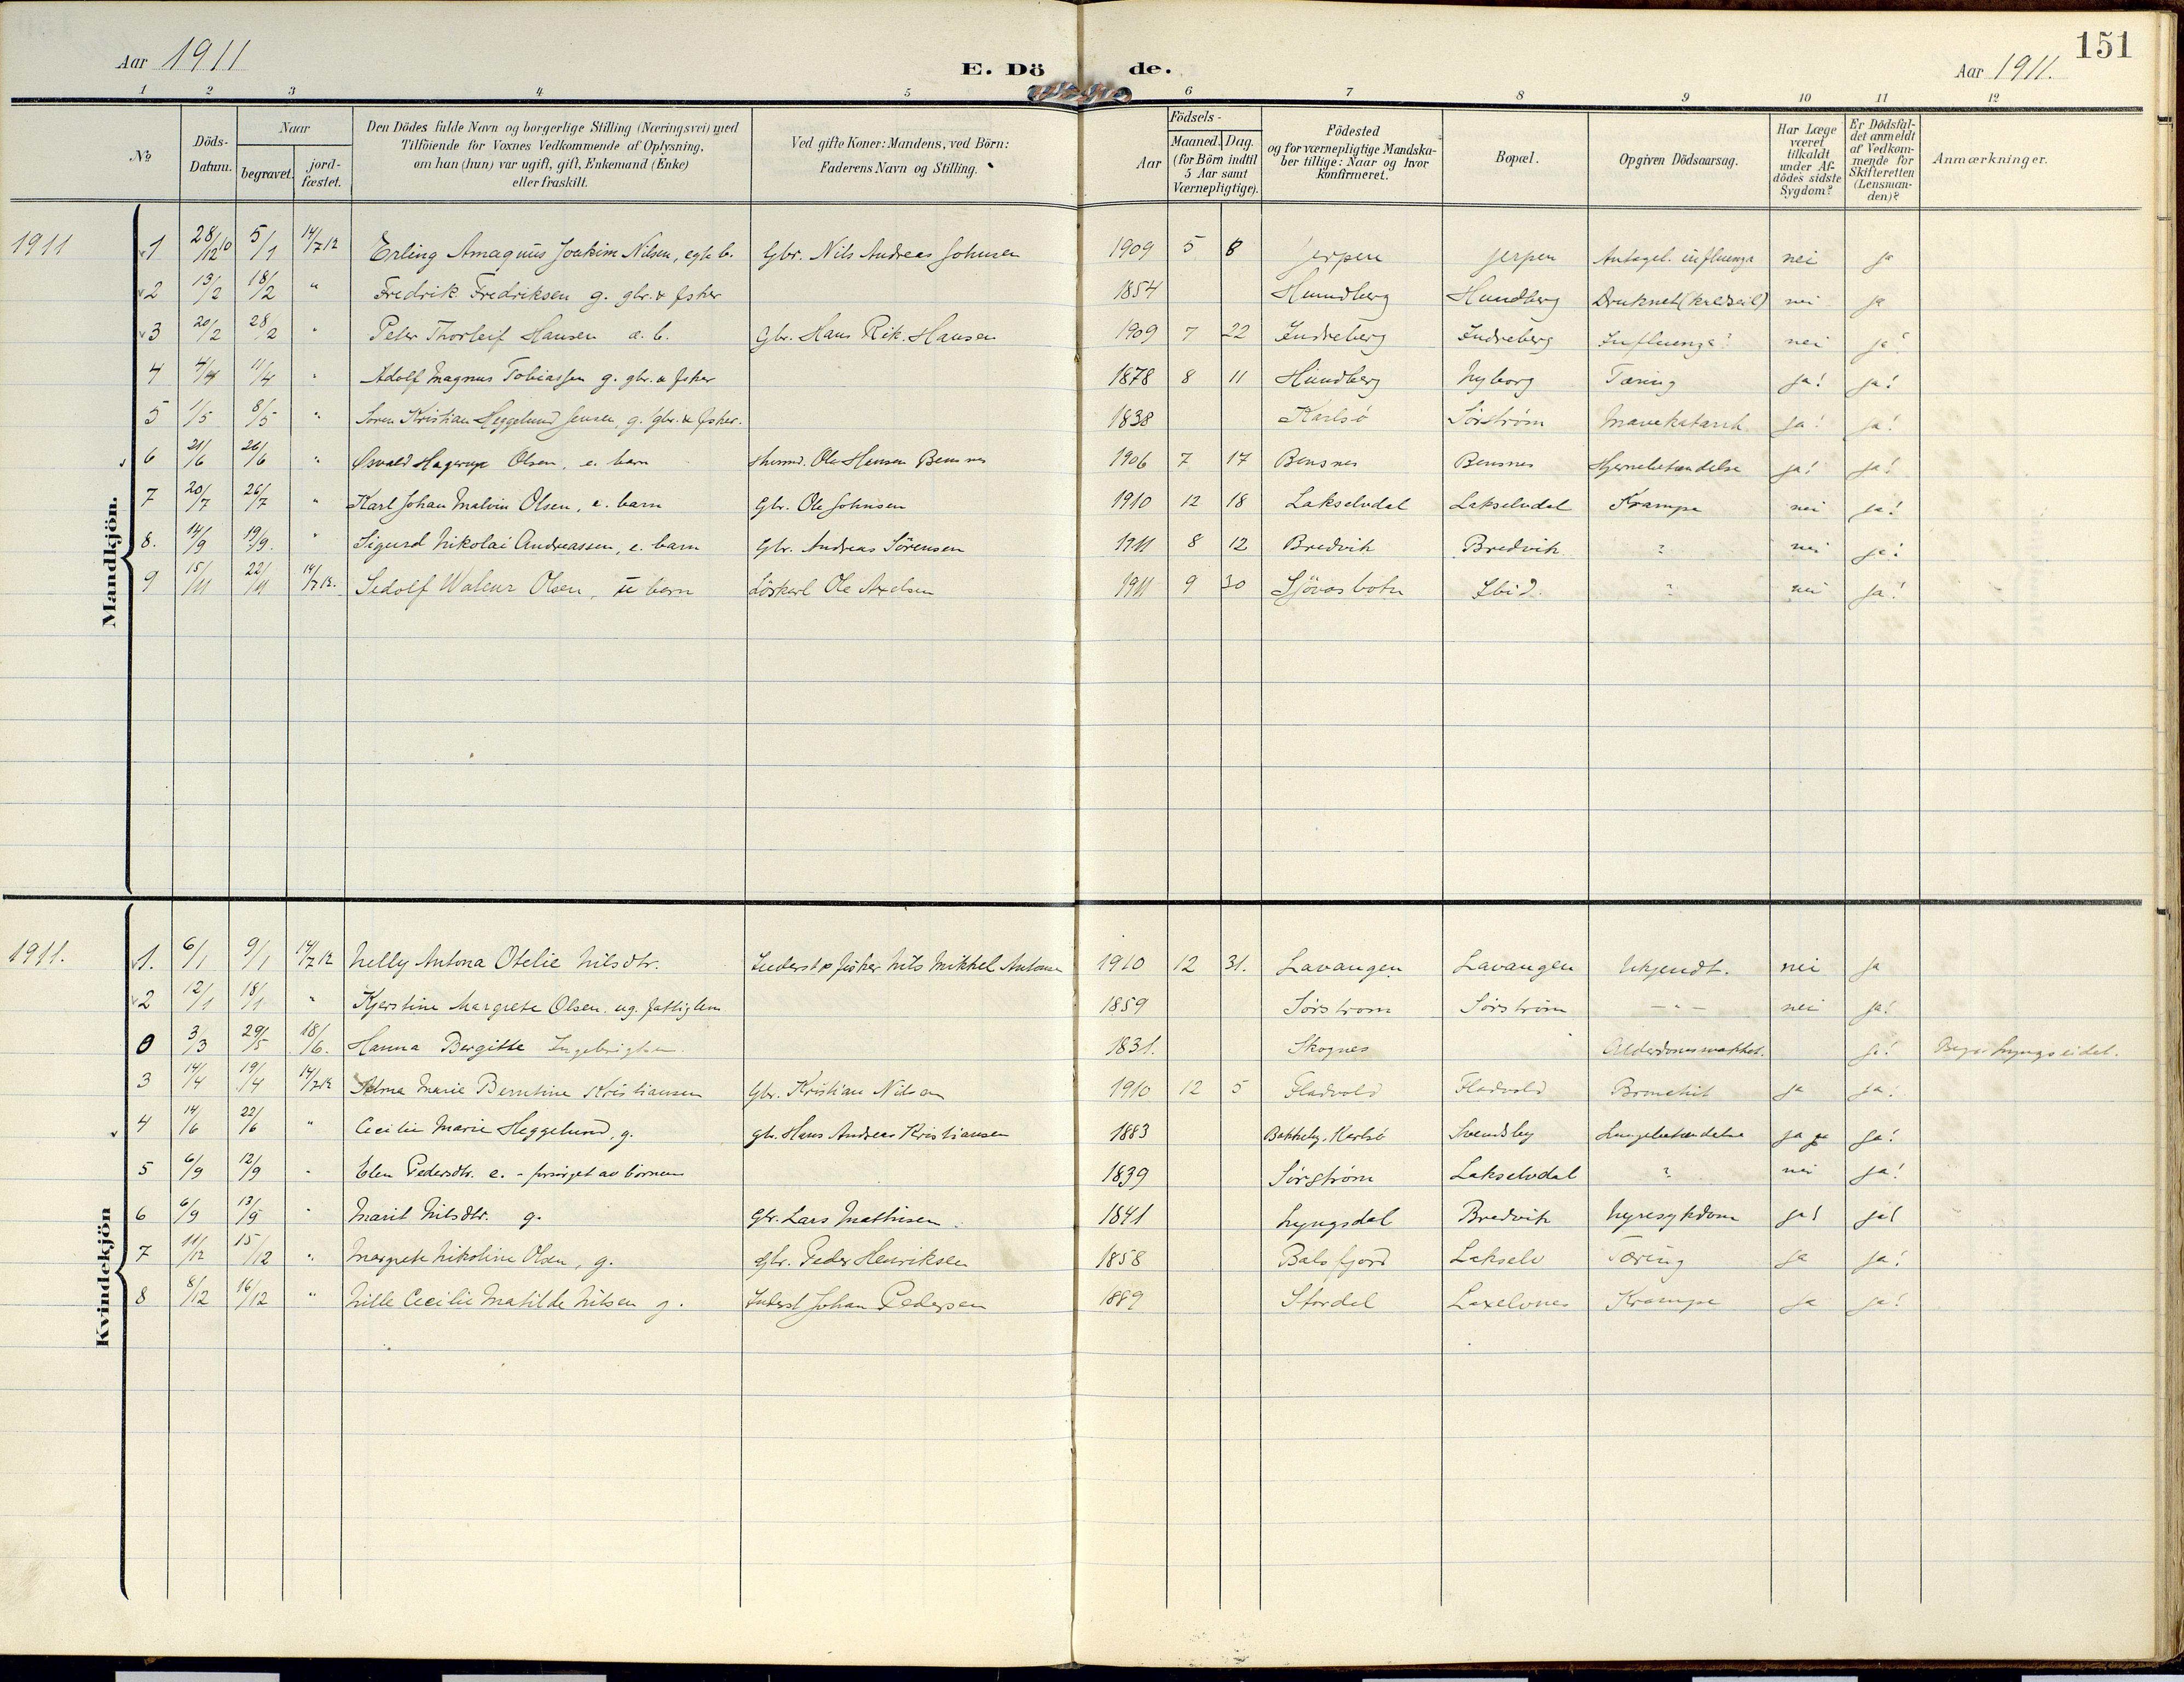 SATØ, Lyngen sokneprestembete, Ministerialbok nr. 14, 1905-1920, s. 151